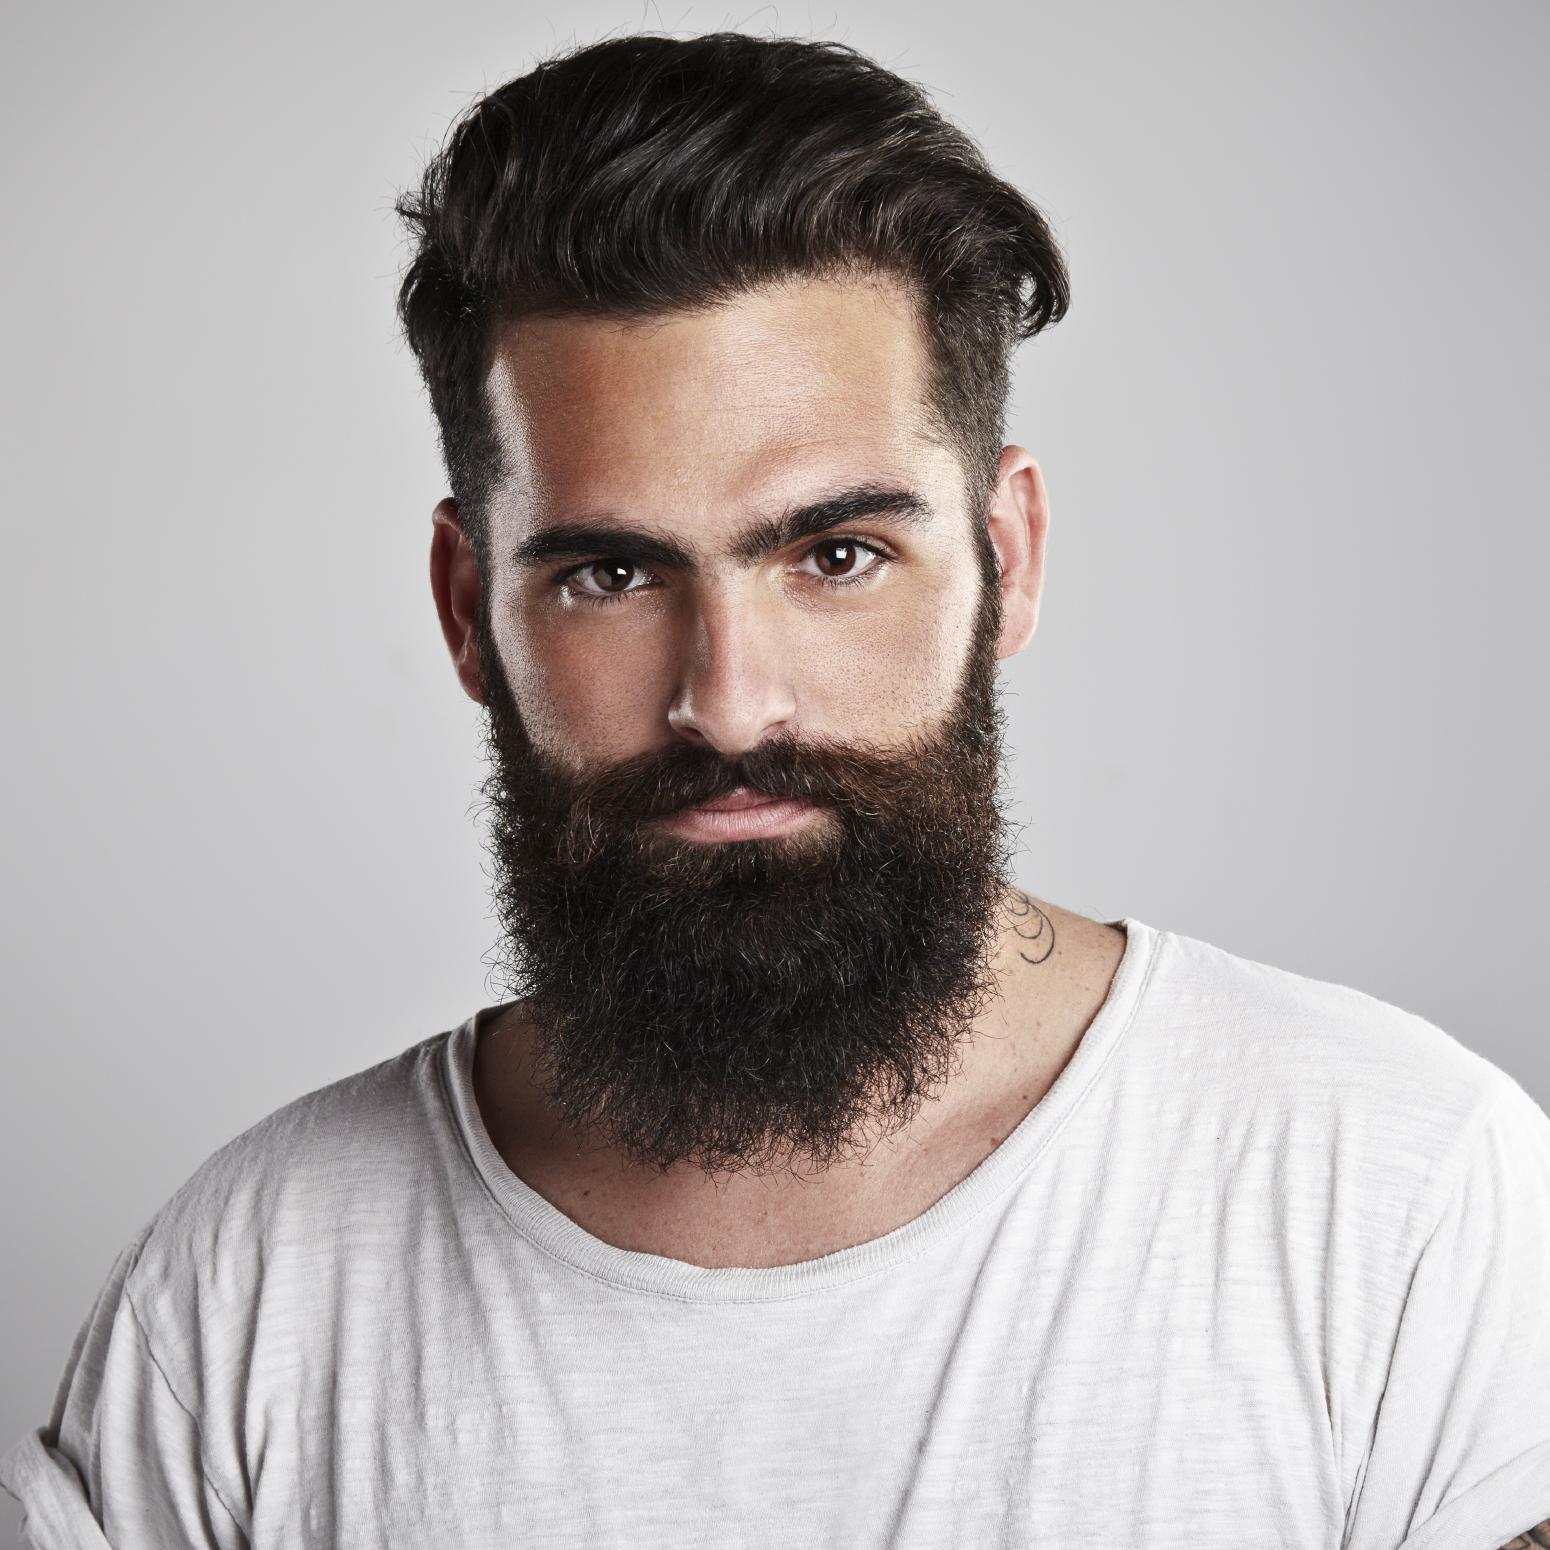 Grosse barbe les avantages et les inconv nients d couvrir ici - Barbe hipster chic ...